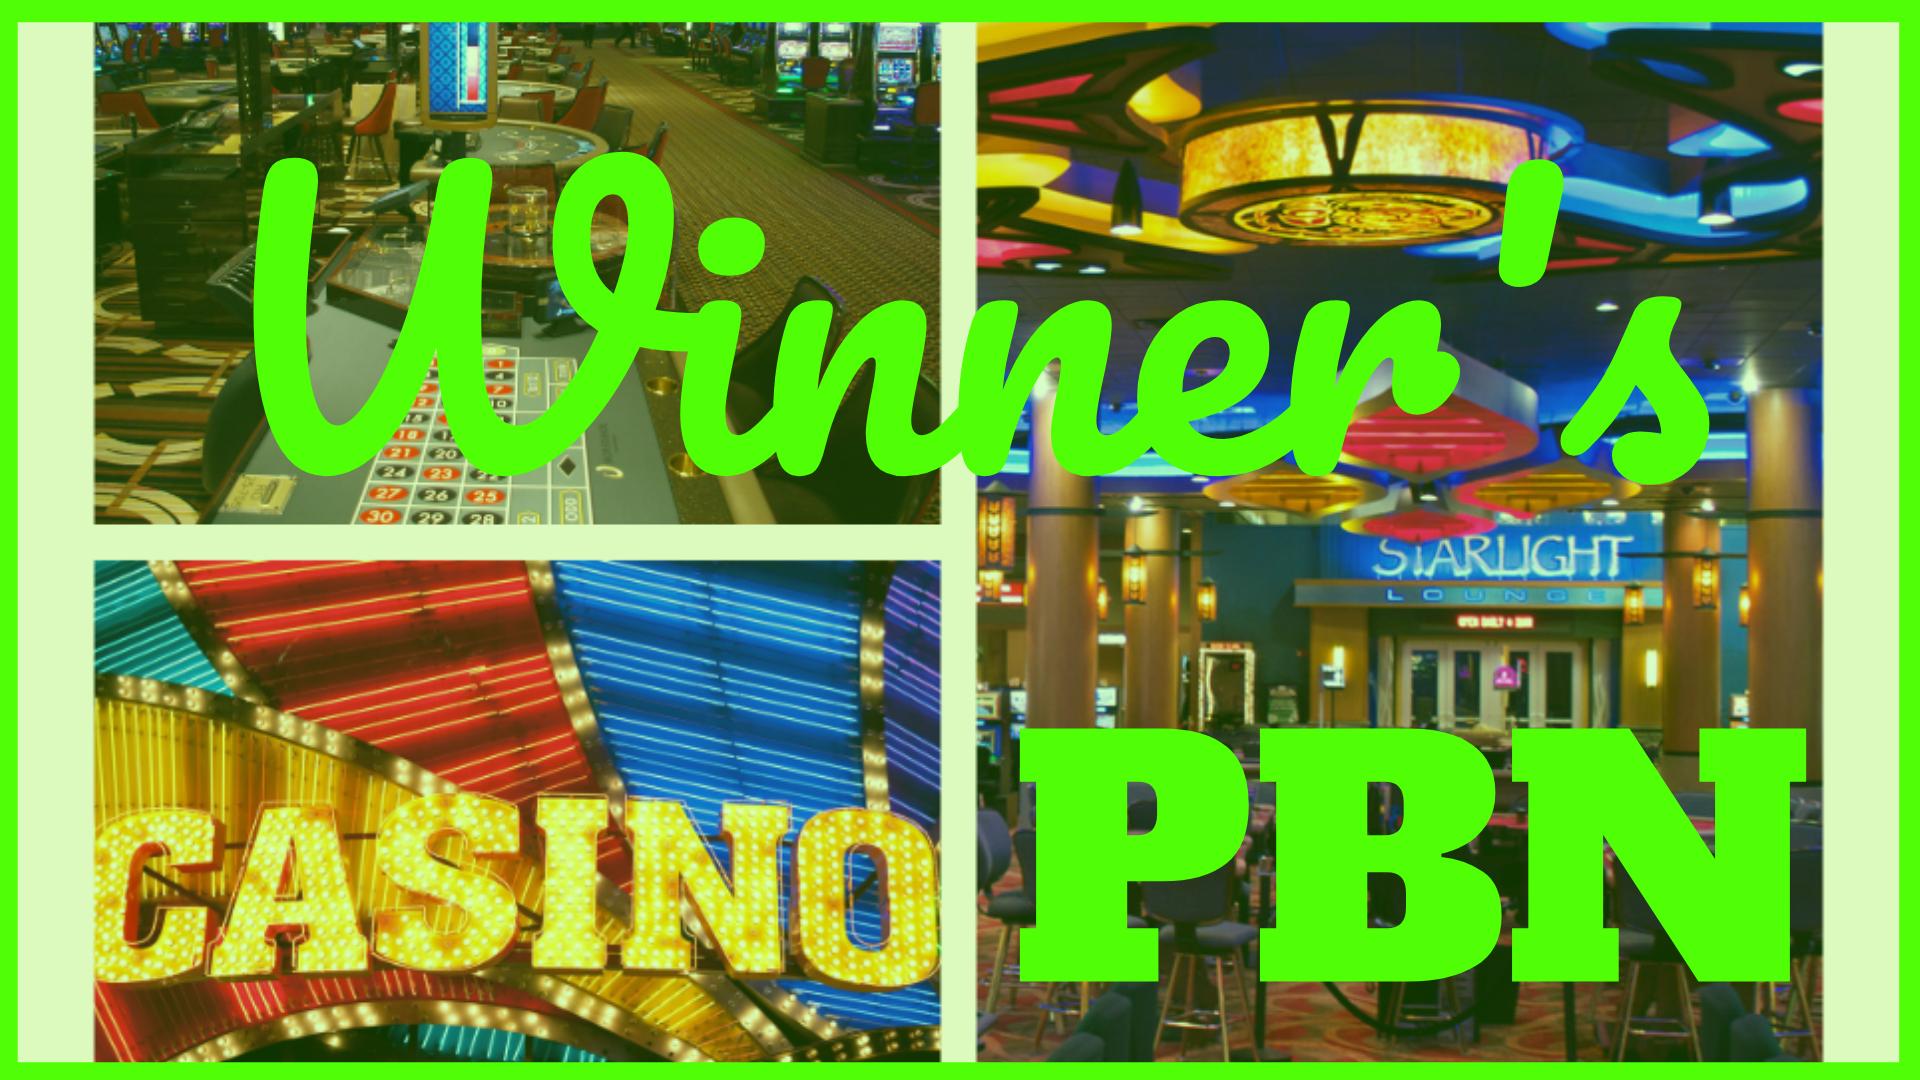 Topmost Casino & Gambling PBN Network - Avg TF - 17 CF - 23 - Handwritten Content by Full-Time Writers